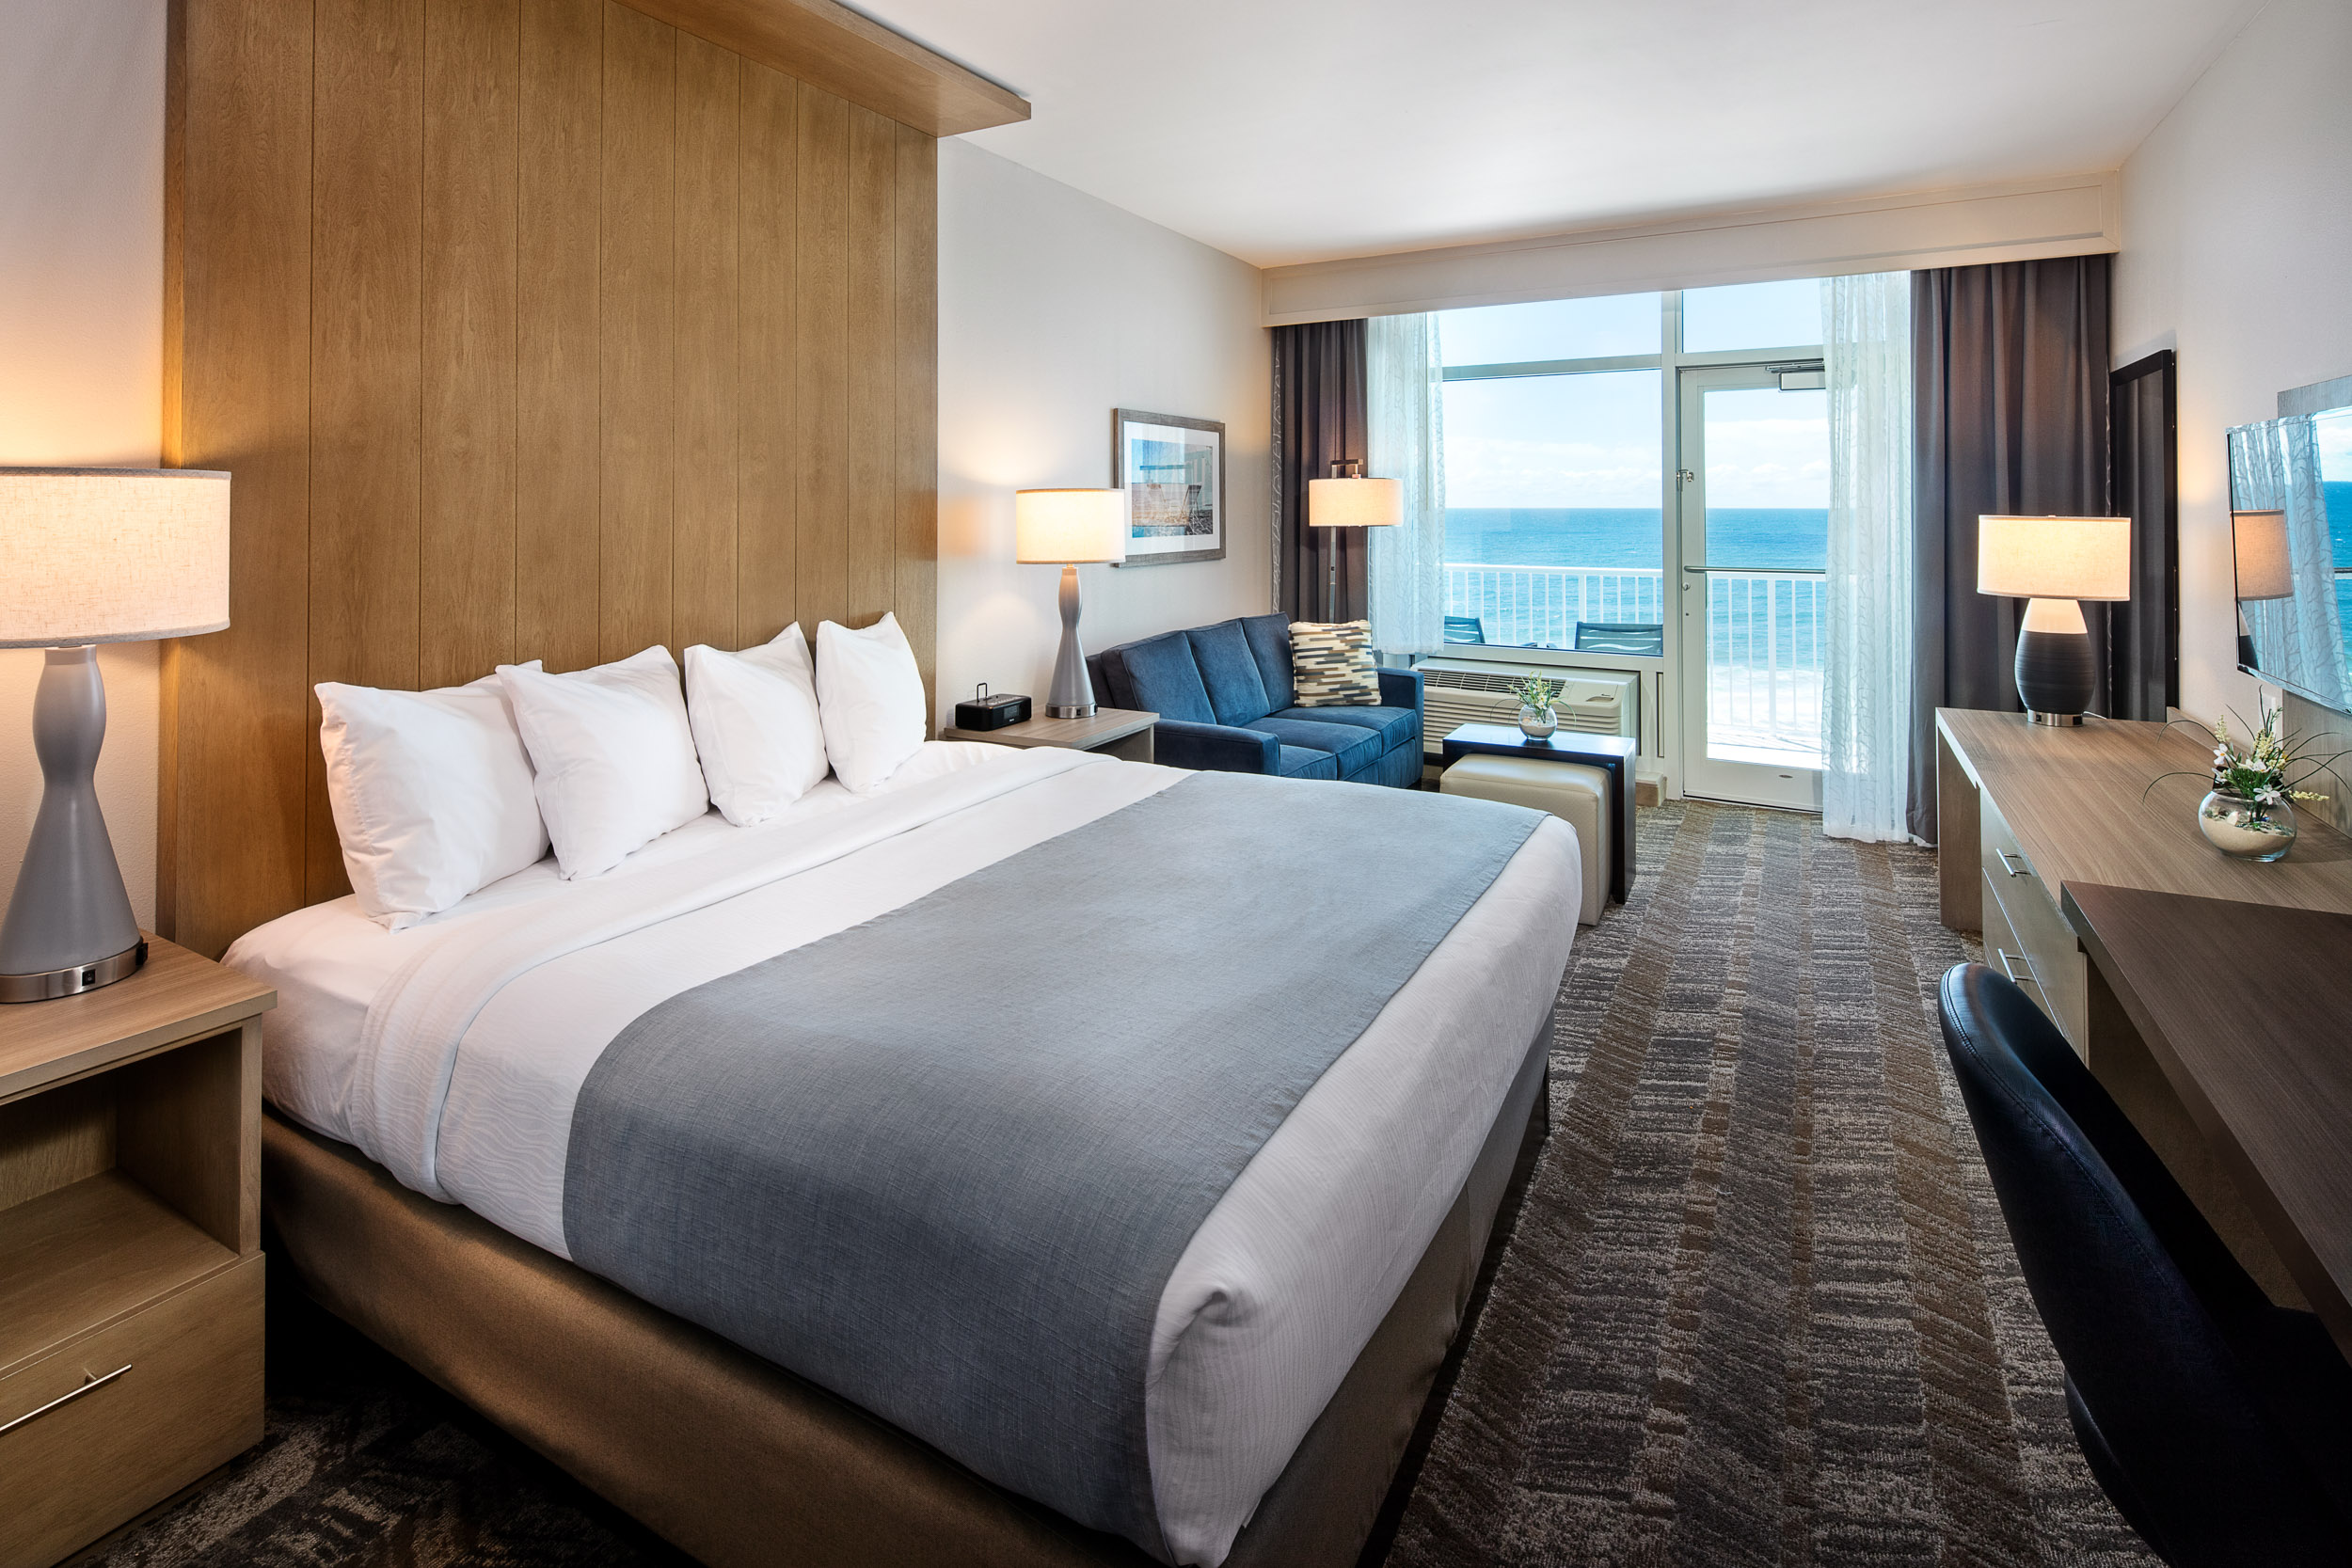 bestwestern_hotel_beachfront_tides-12.jpg